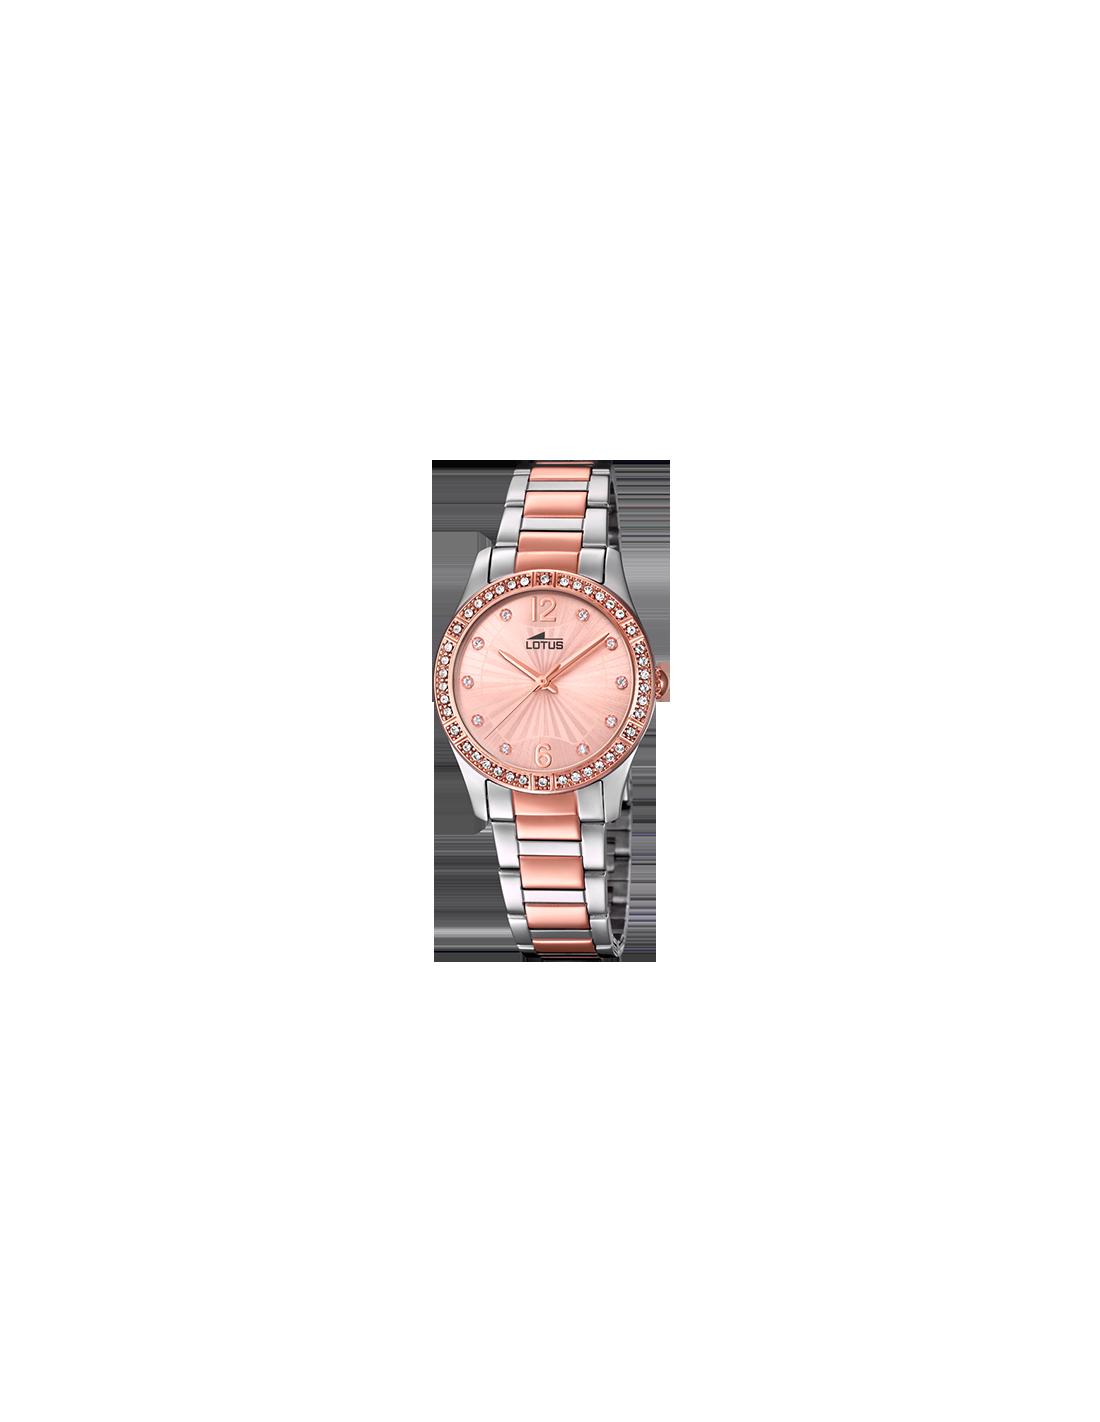 41ca696e0615 Reloj Lotus Bliss 18384 2 de mujer rosado con circonitas - Ses nines